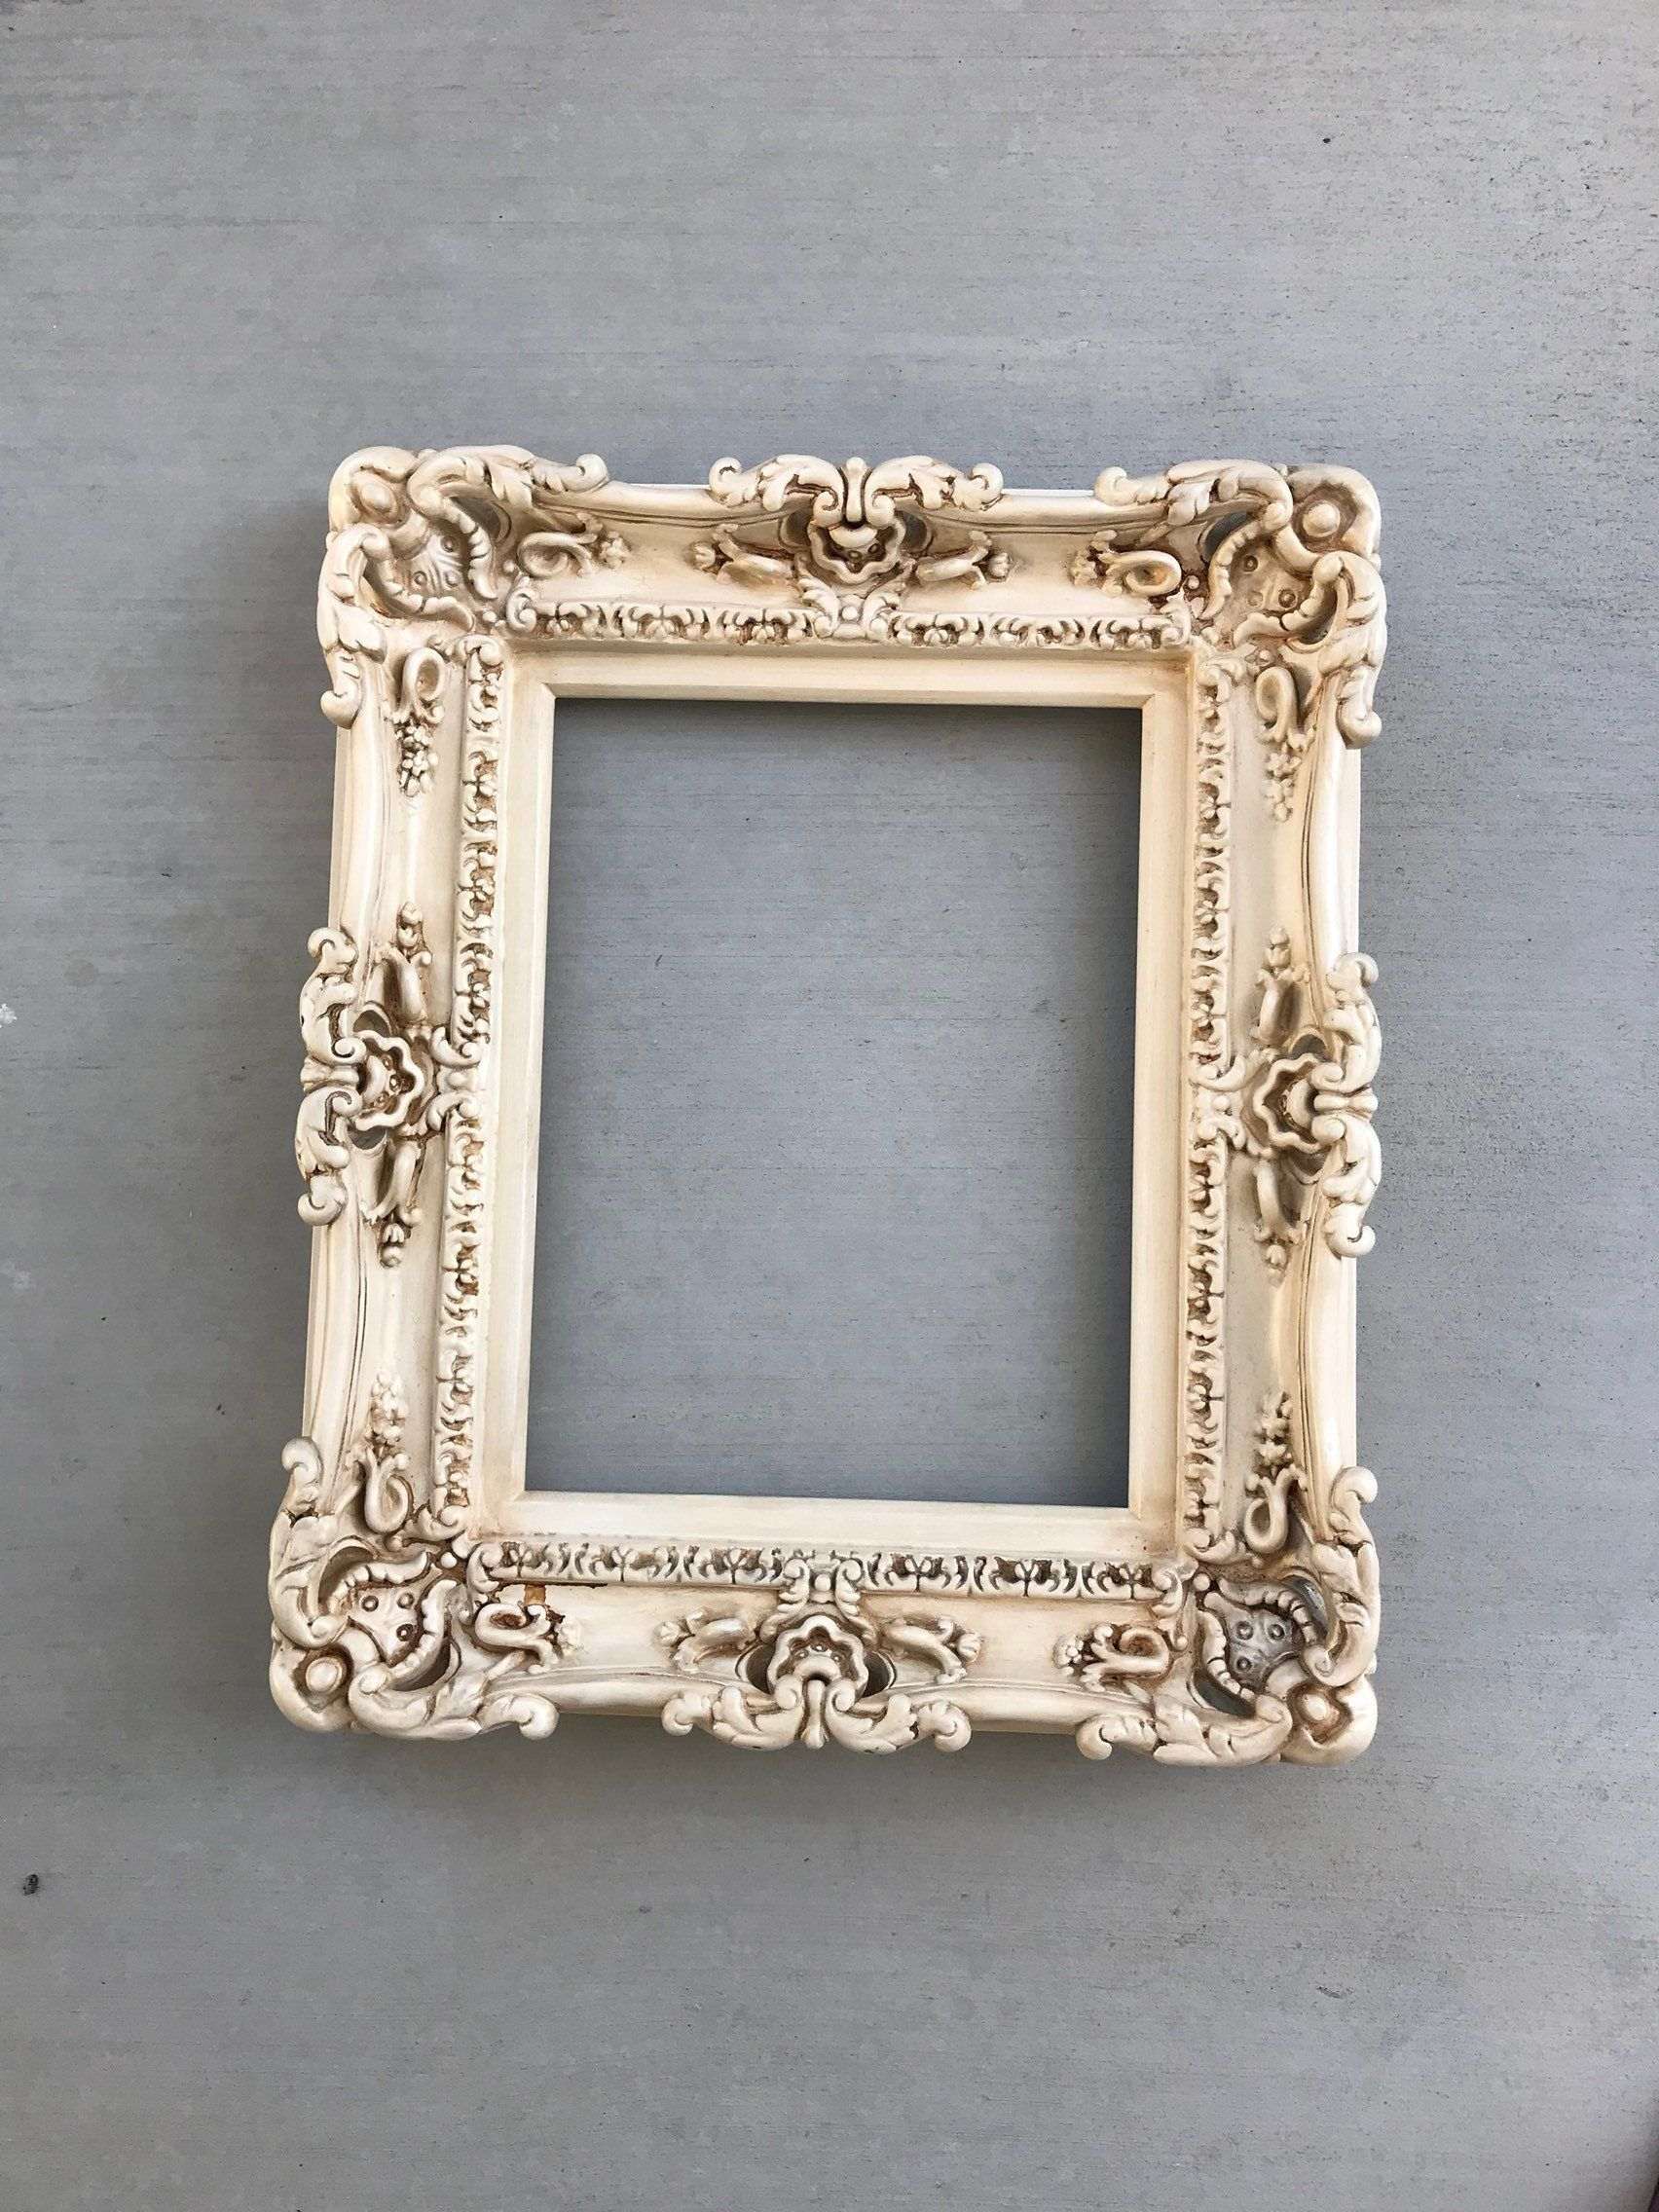 12x16 Vintage Shabby Chic Frame Decorative Baroque Frame Etsy Chic Frames Ornate Picture Frames Shabby Chic Picture Frames